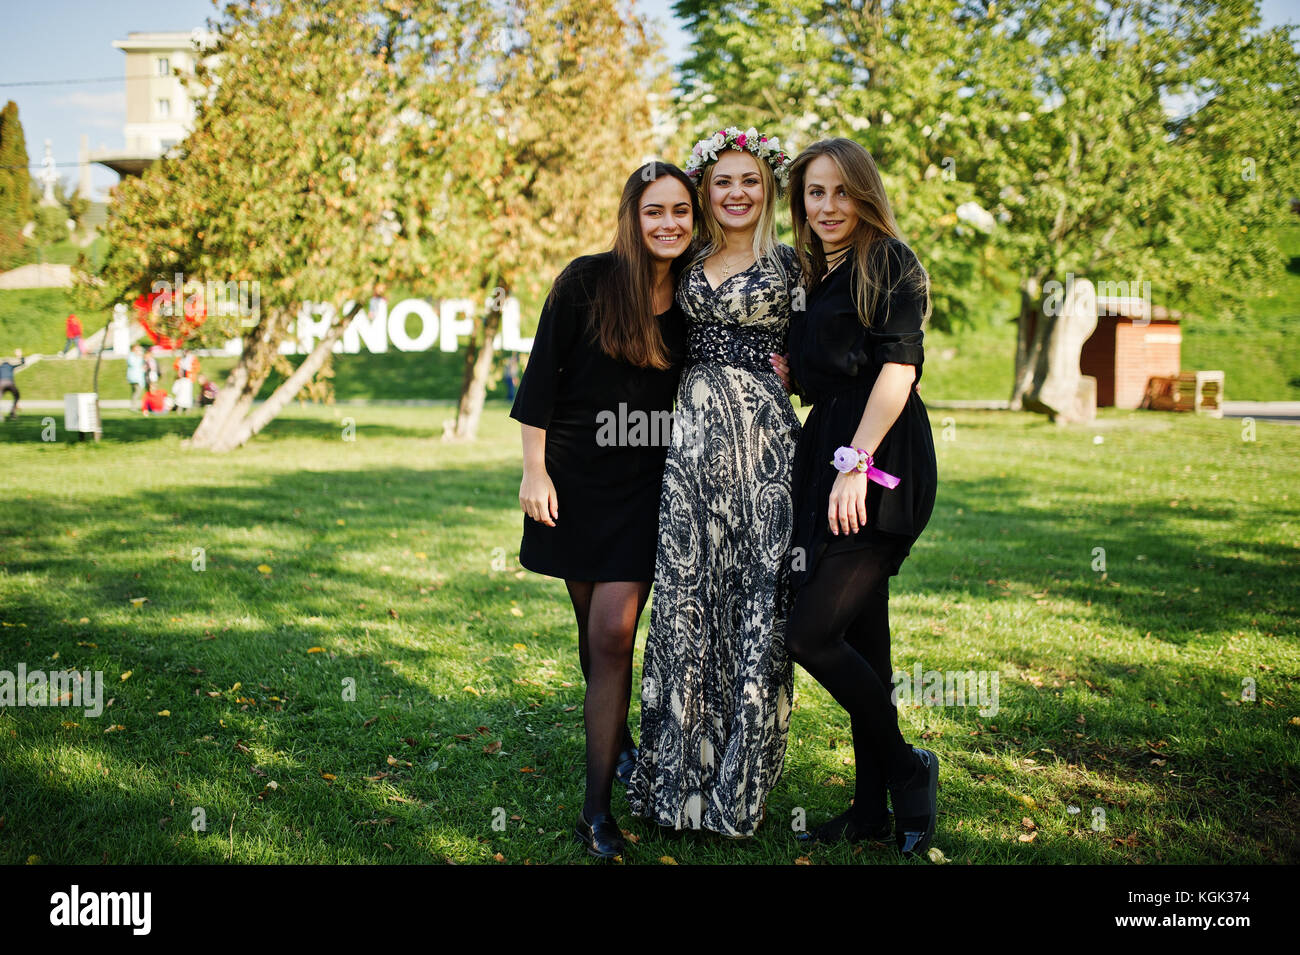 Three girls squirting